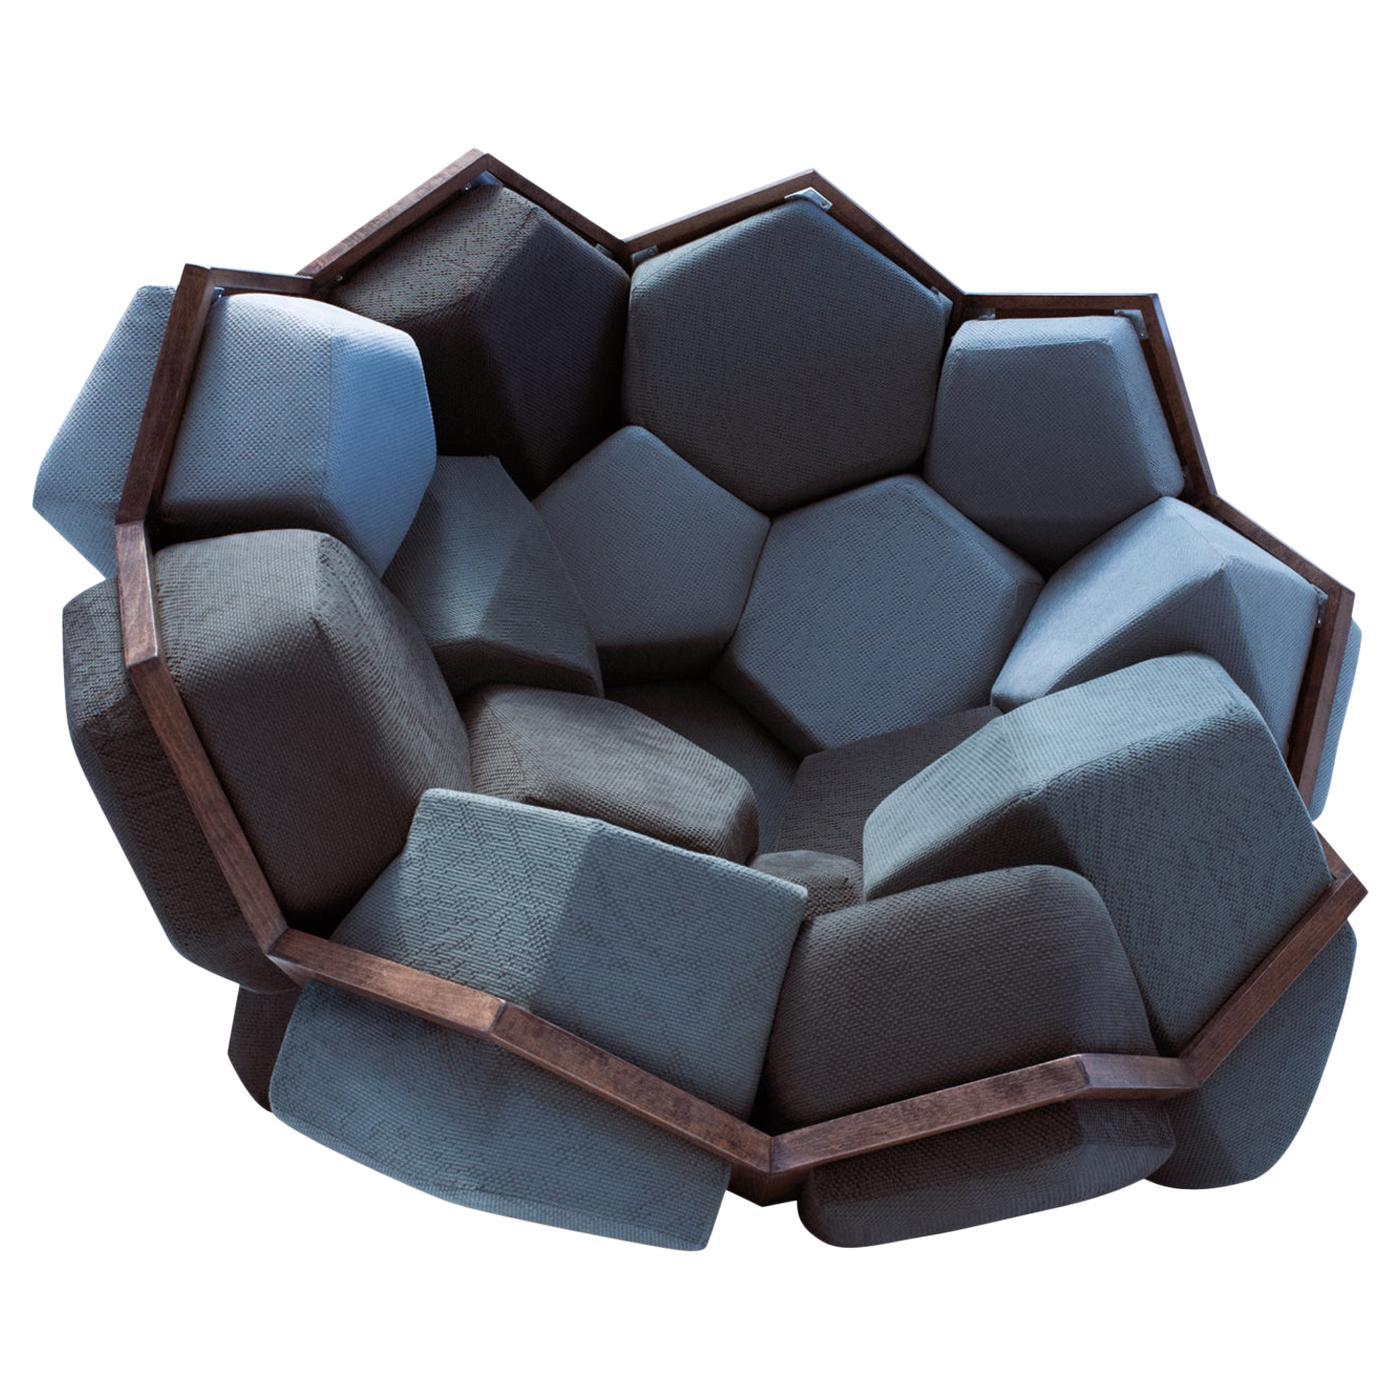 New And Custom Armchairs